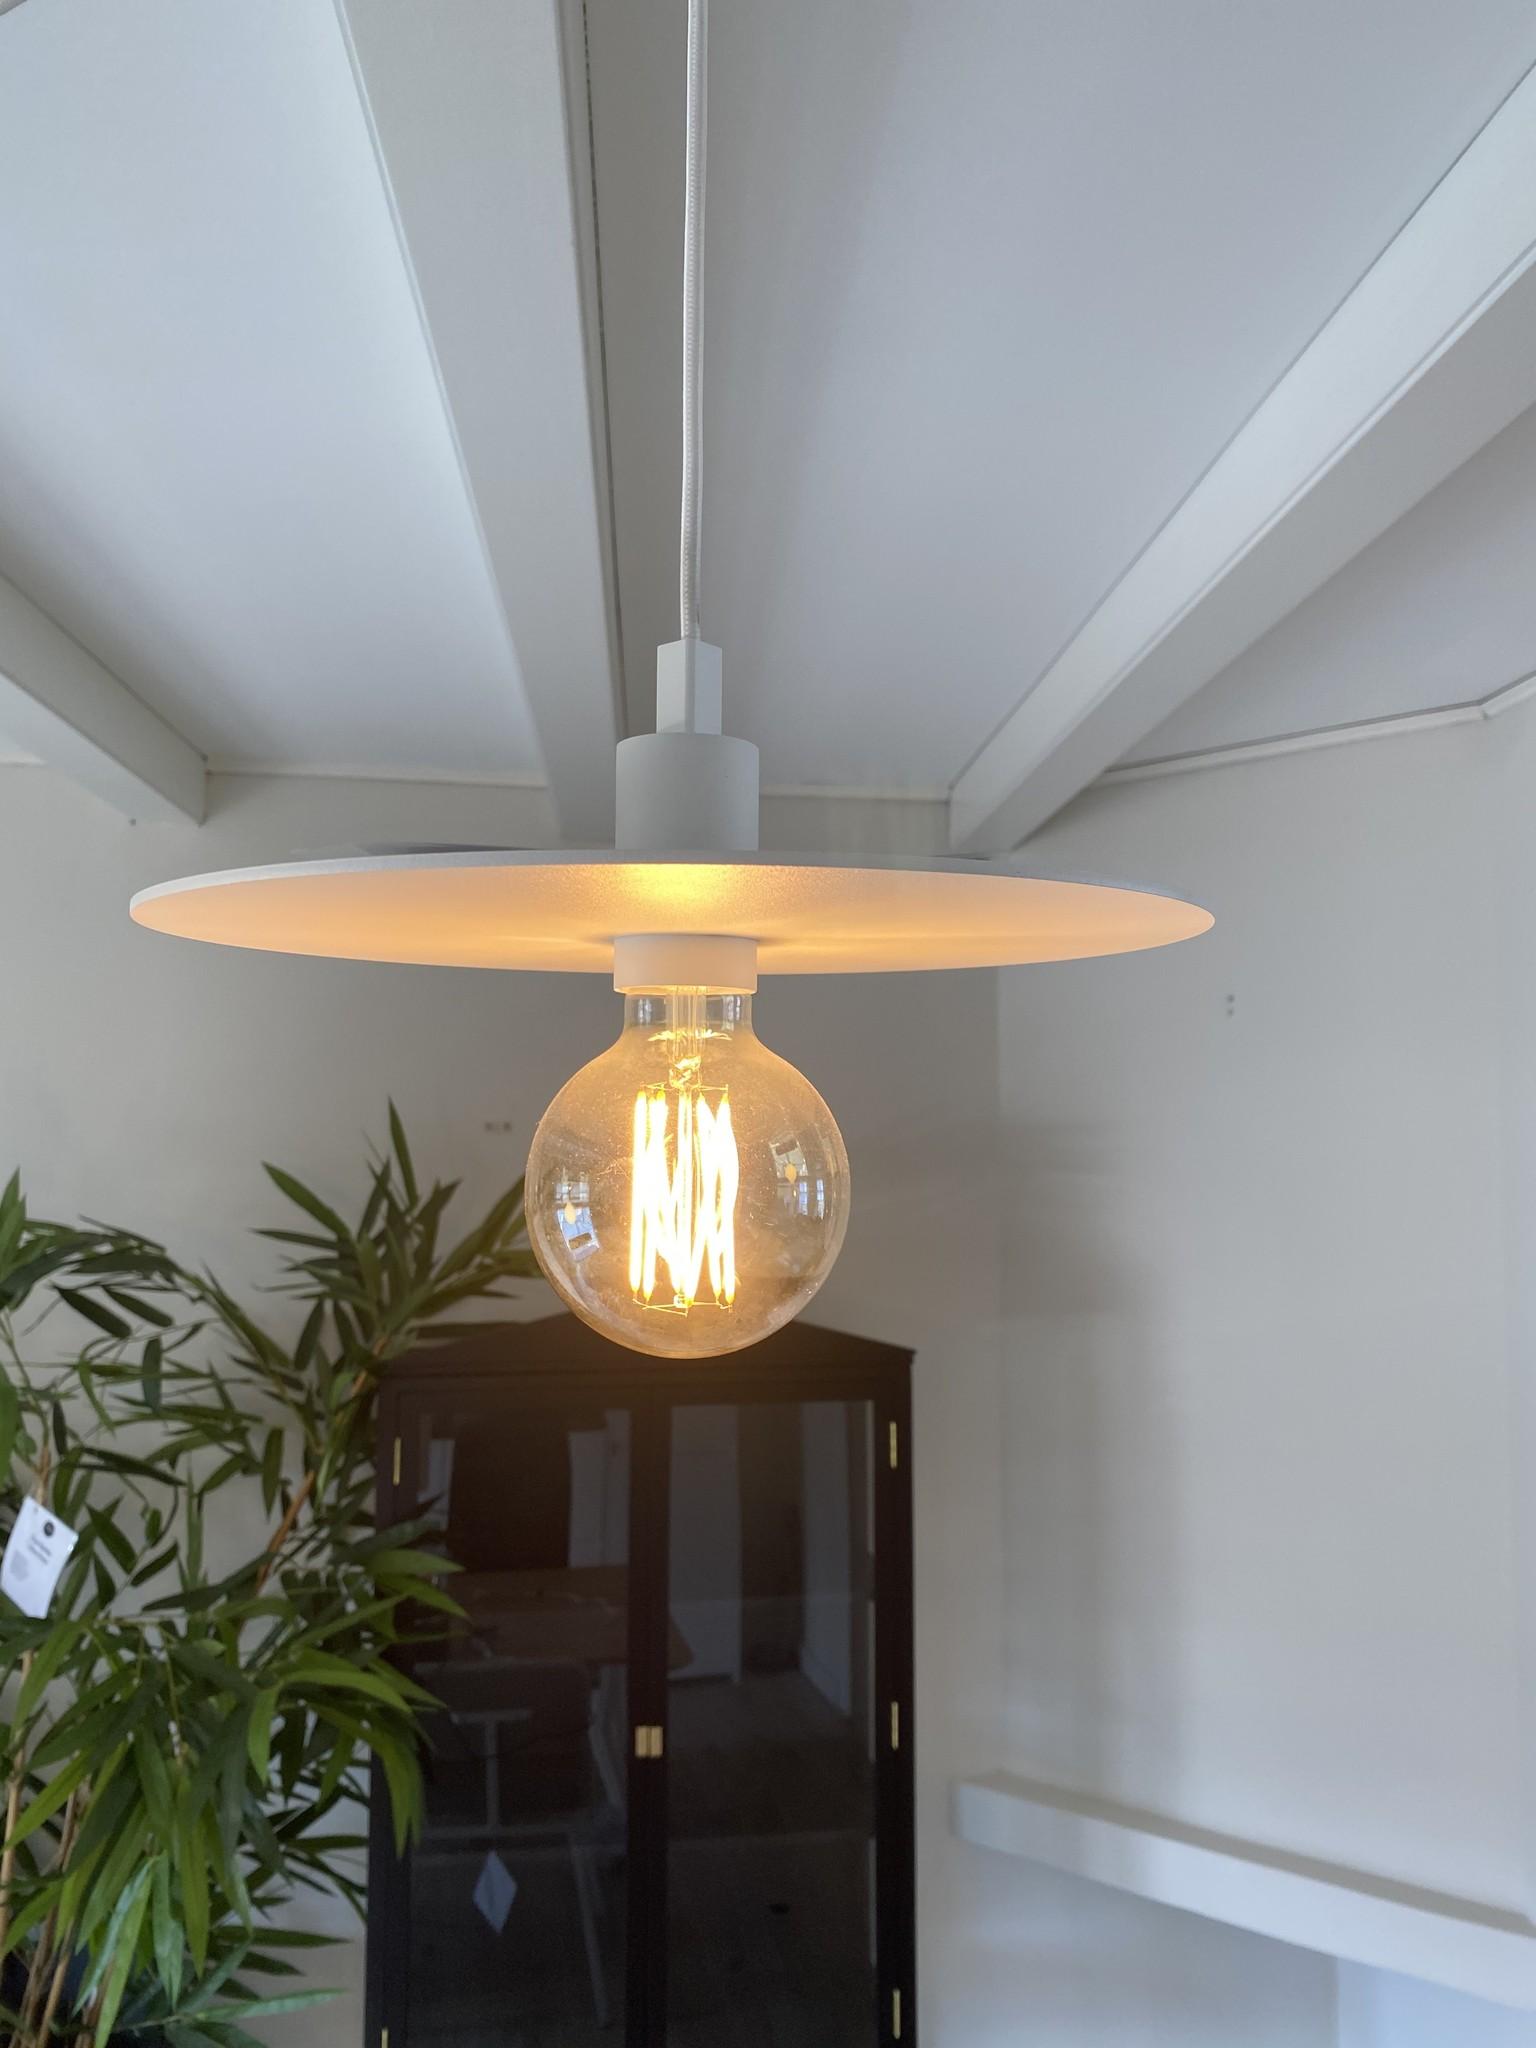 Hanglamp Nod Pendant XL-1